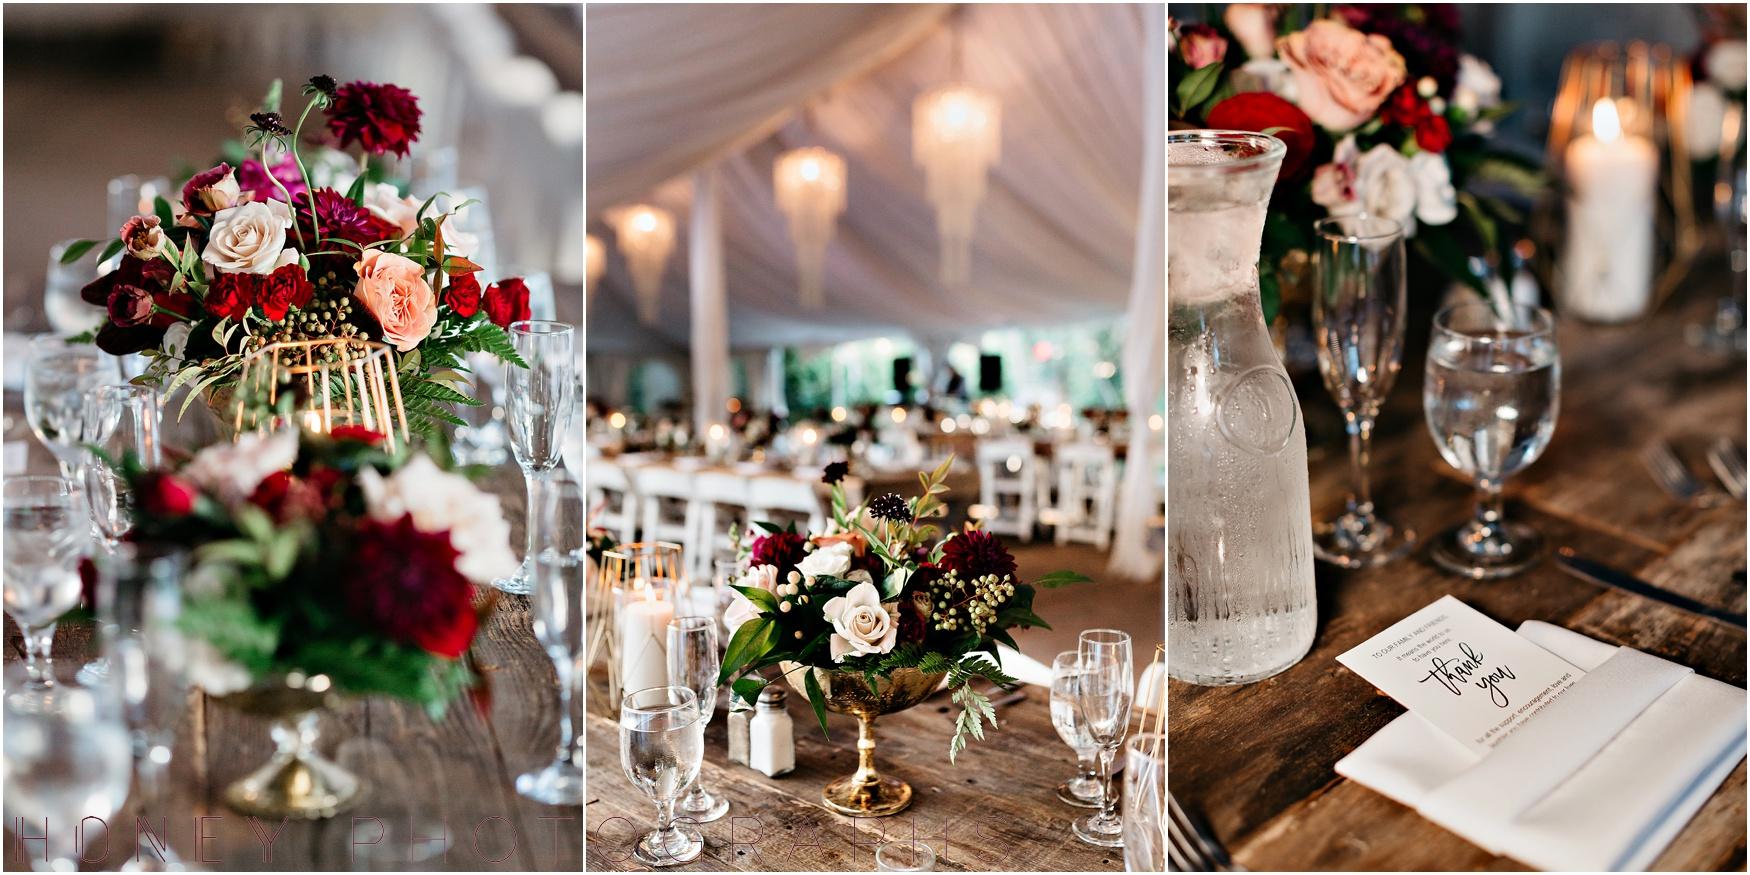 twin_oaks_garden_estate_fall_winter_burgundy_wedding044.jpg